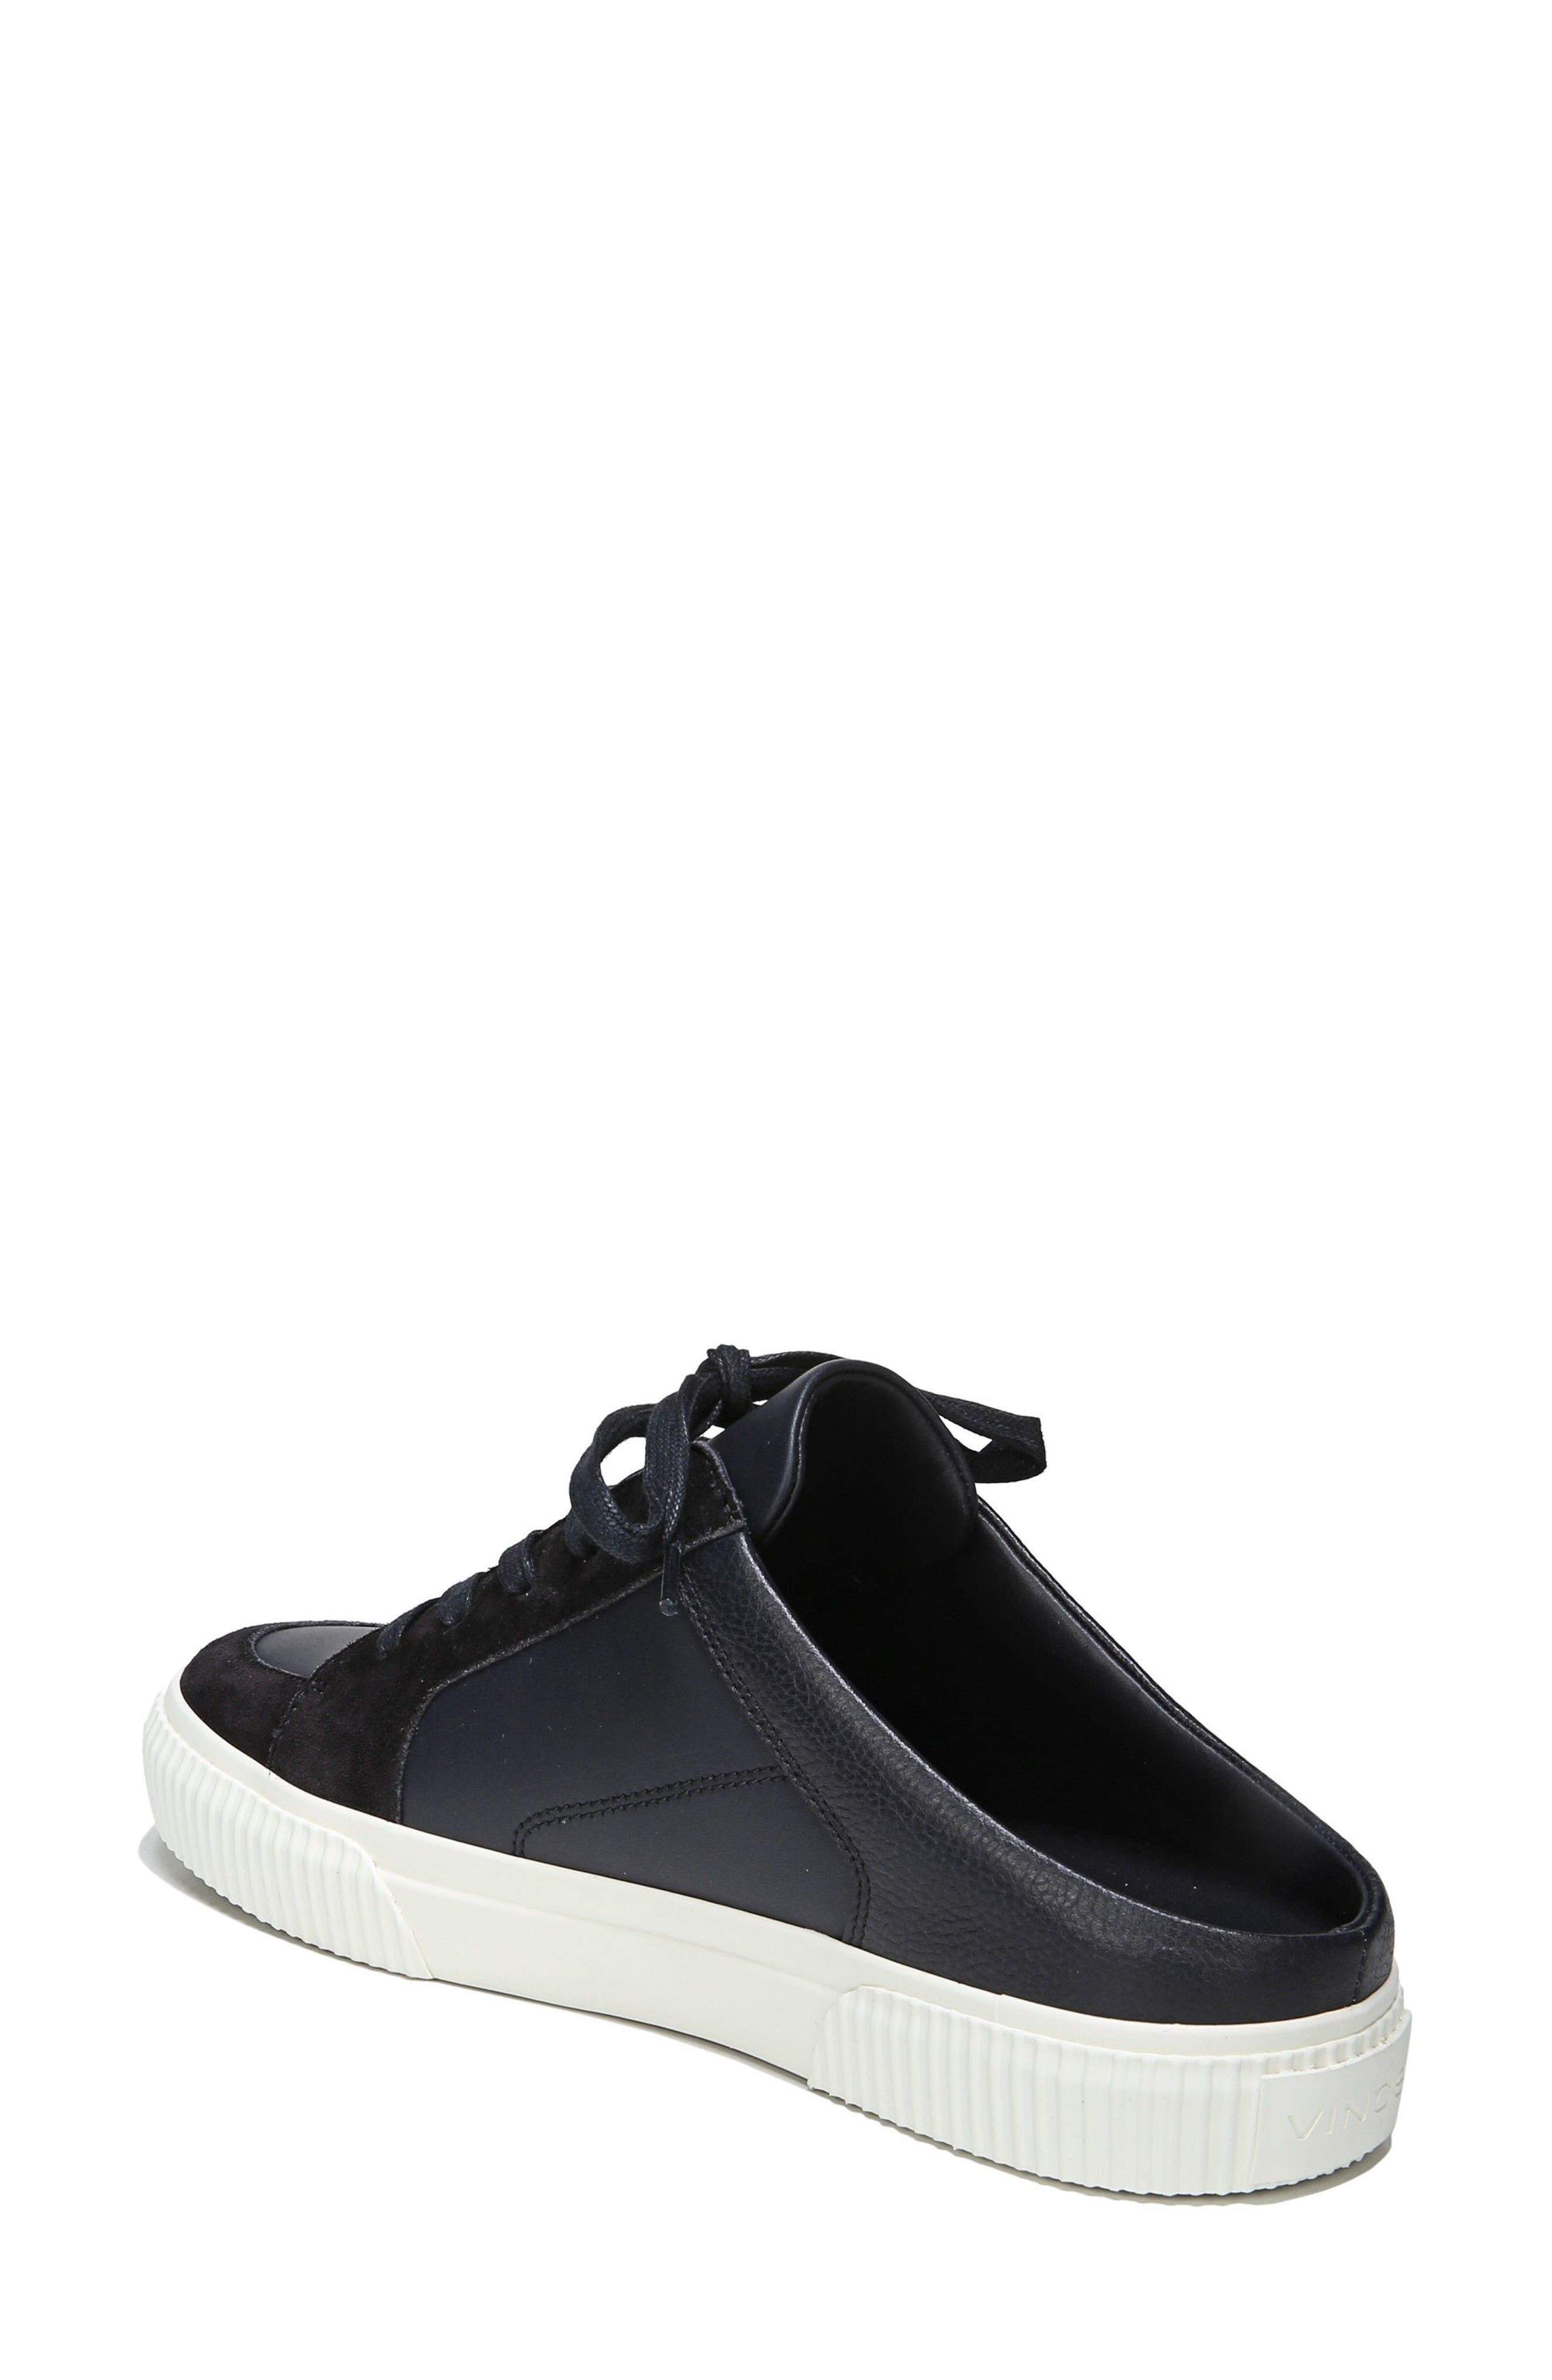 Kess Slip-On Sneaker,                             Alternate thumbnail 2, color,                             Coastal